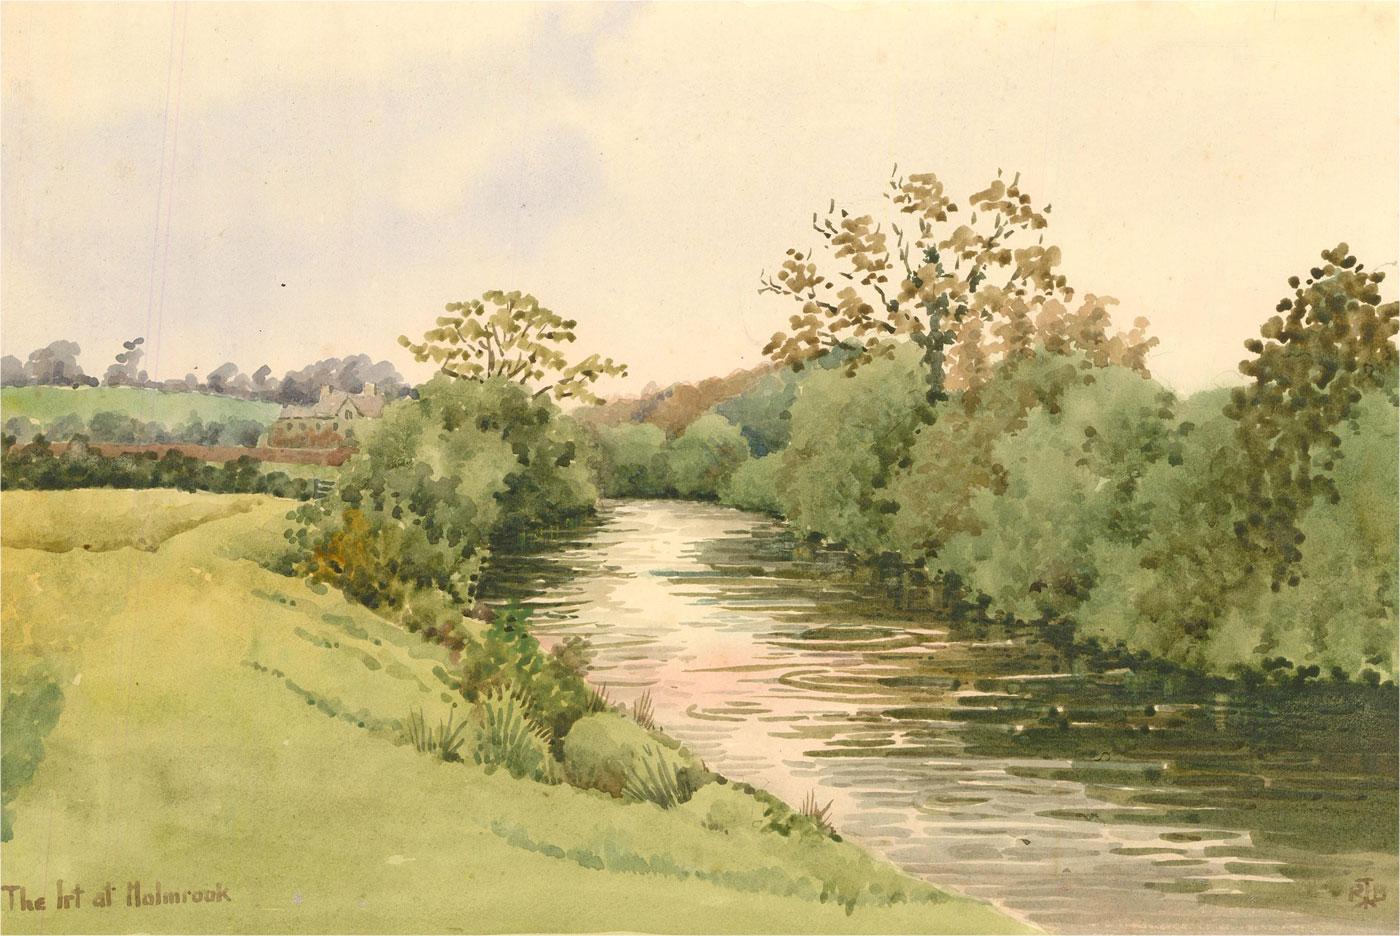 Raymond Turner Barker (1872-1945) - Watercolour, River Irt at Holmrook